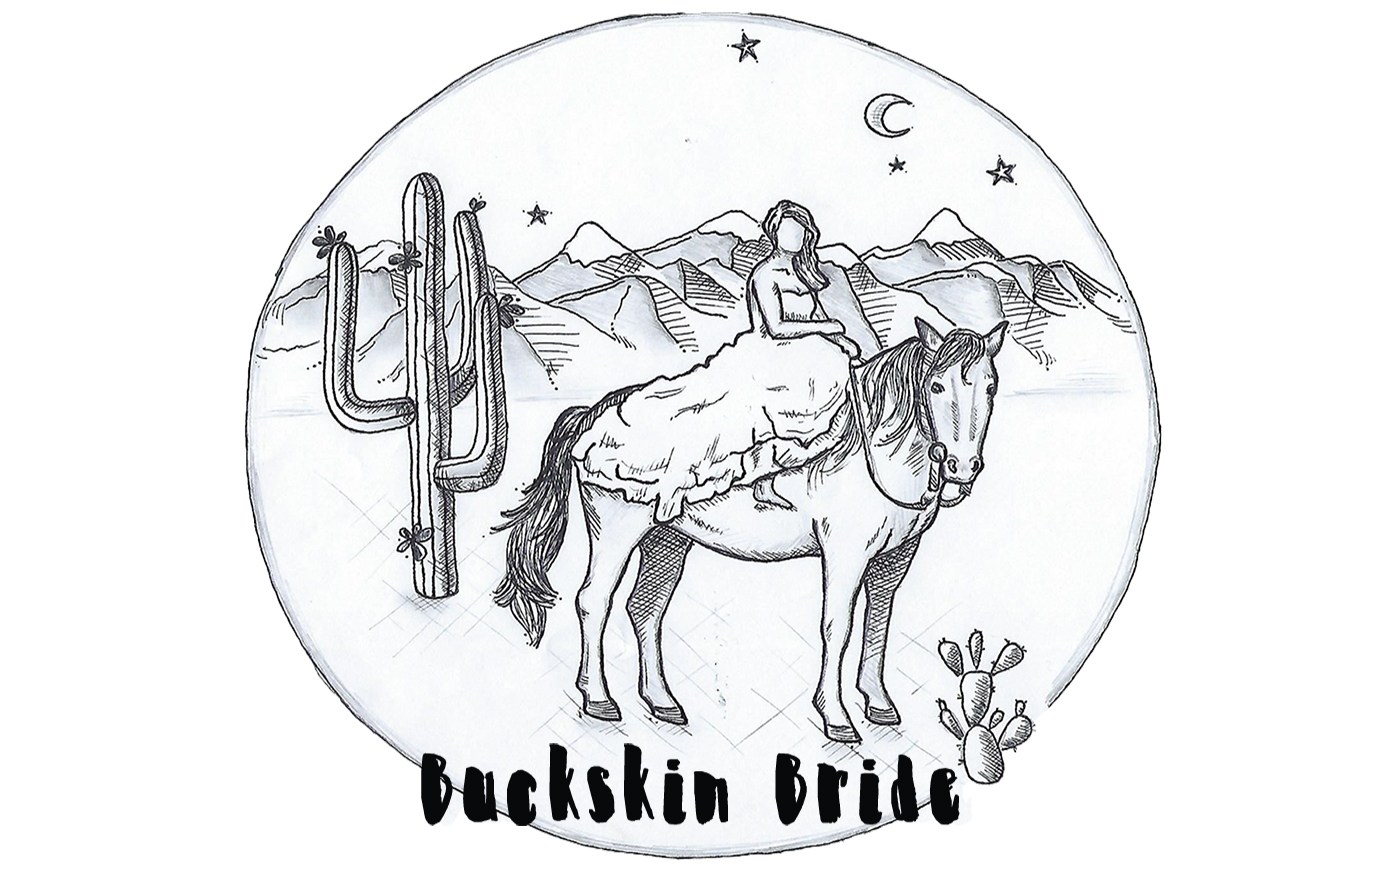 Buckskin Bride